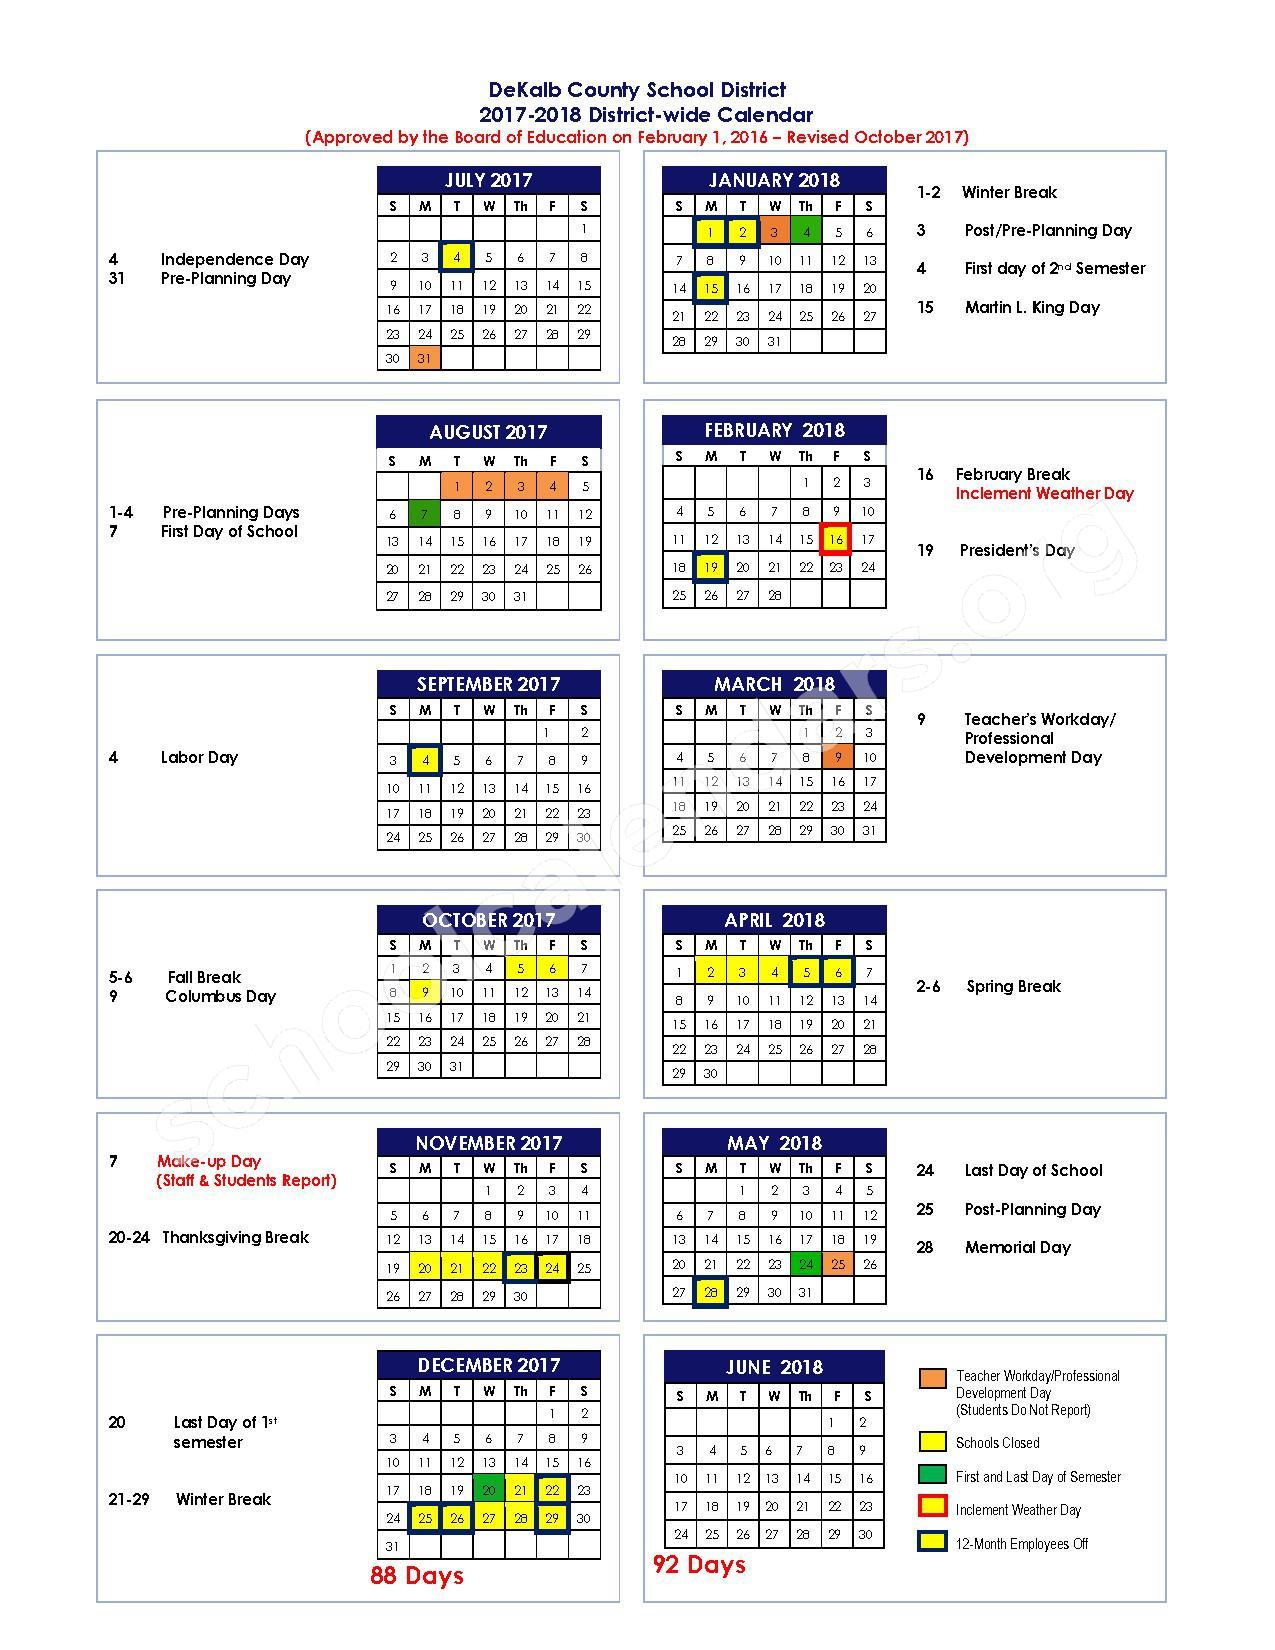 2017 - 2018 District Calendar – Dekalb County School District – page 1